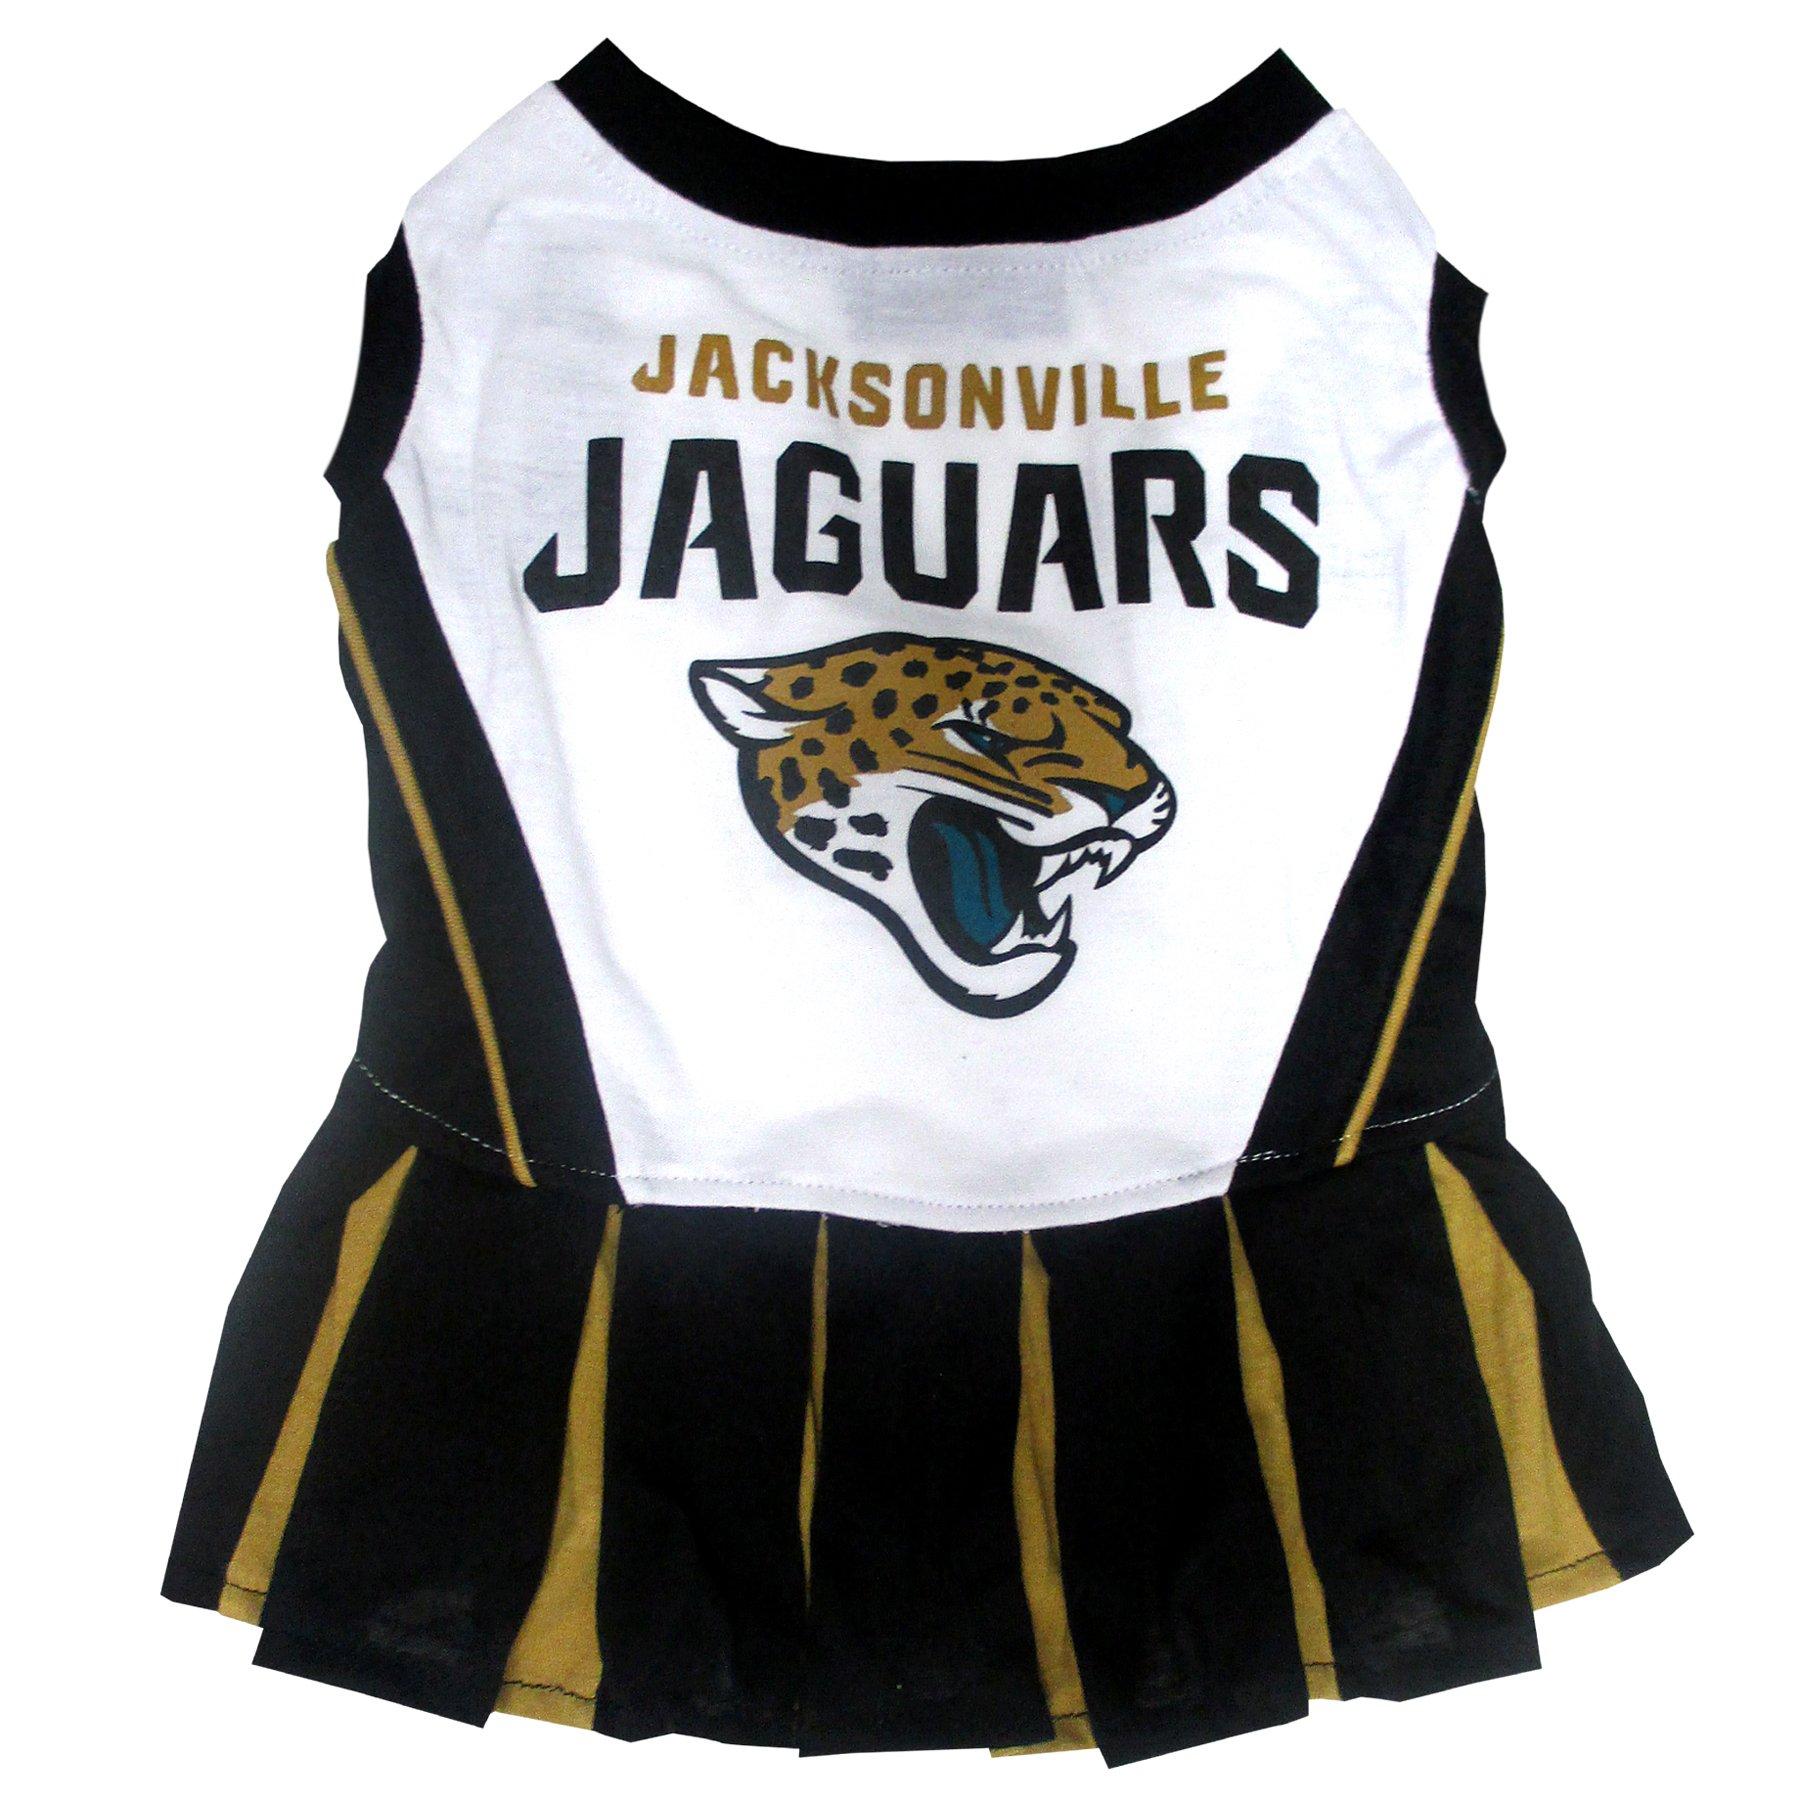 Jacksonville Jaguars NFL Cheerleader Dress For Dogs - Size Small